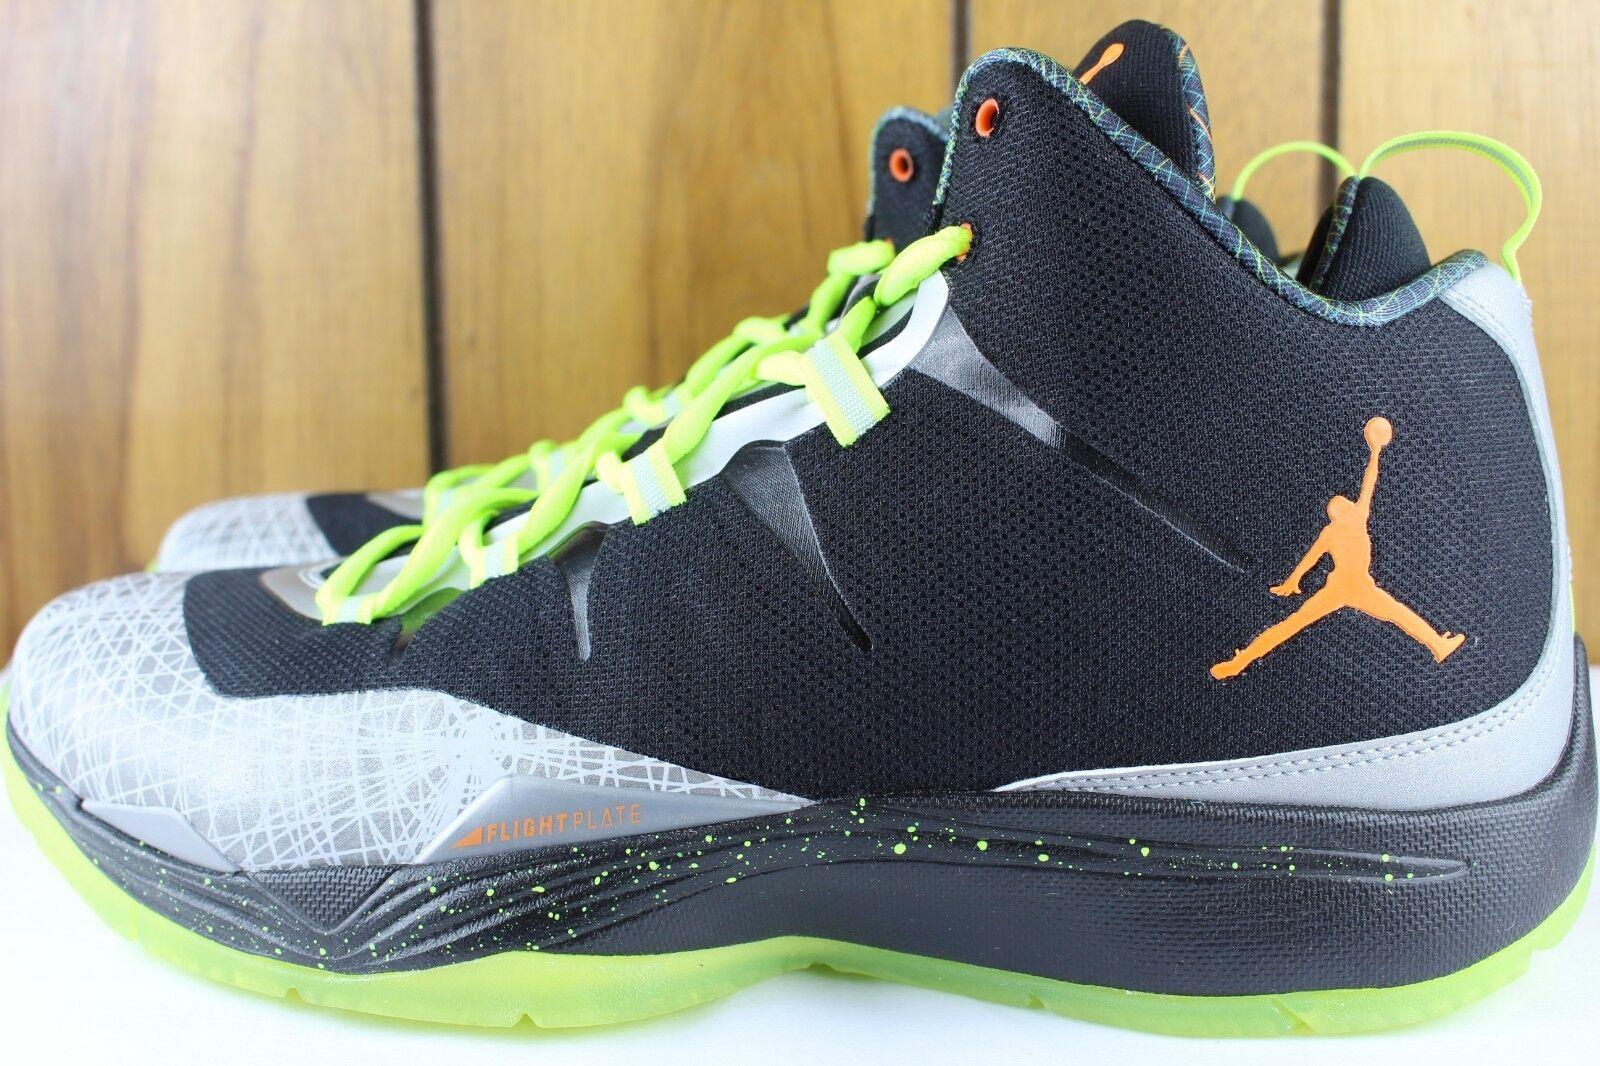 Nike Jordan Super Super Super Fly 2 Navidad Talla 11.0 total Naranja Reflejo Plateado 640315 025 89dfe0